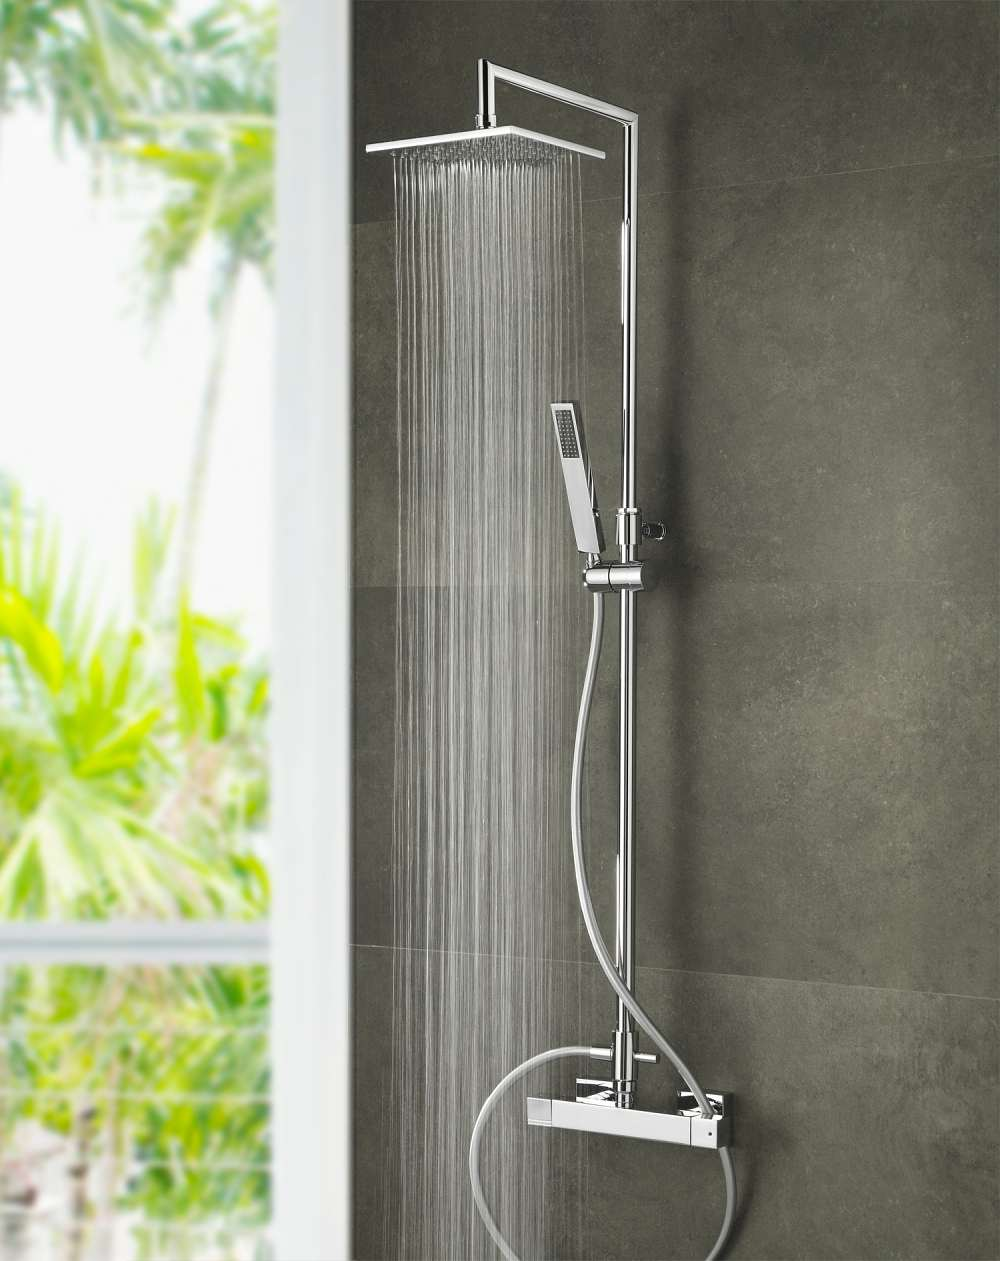 ducha de gran tamaño